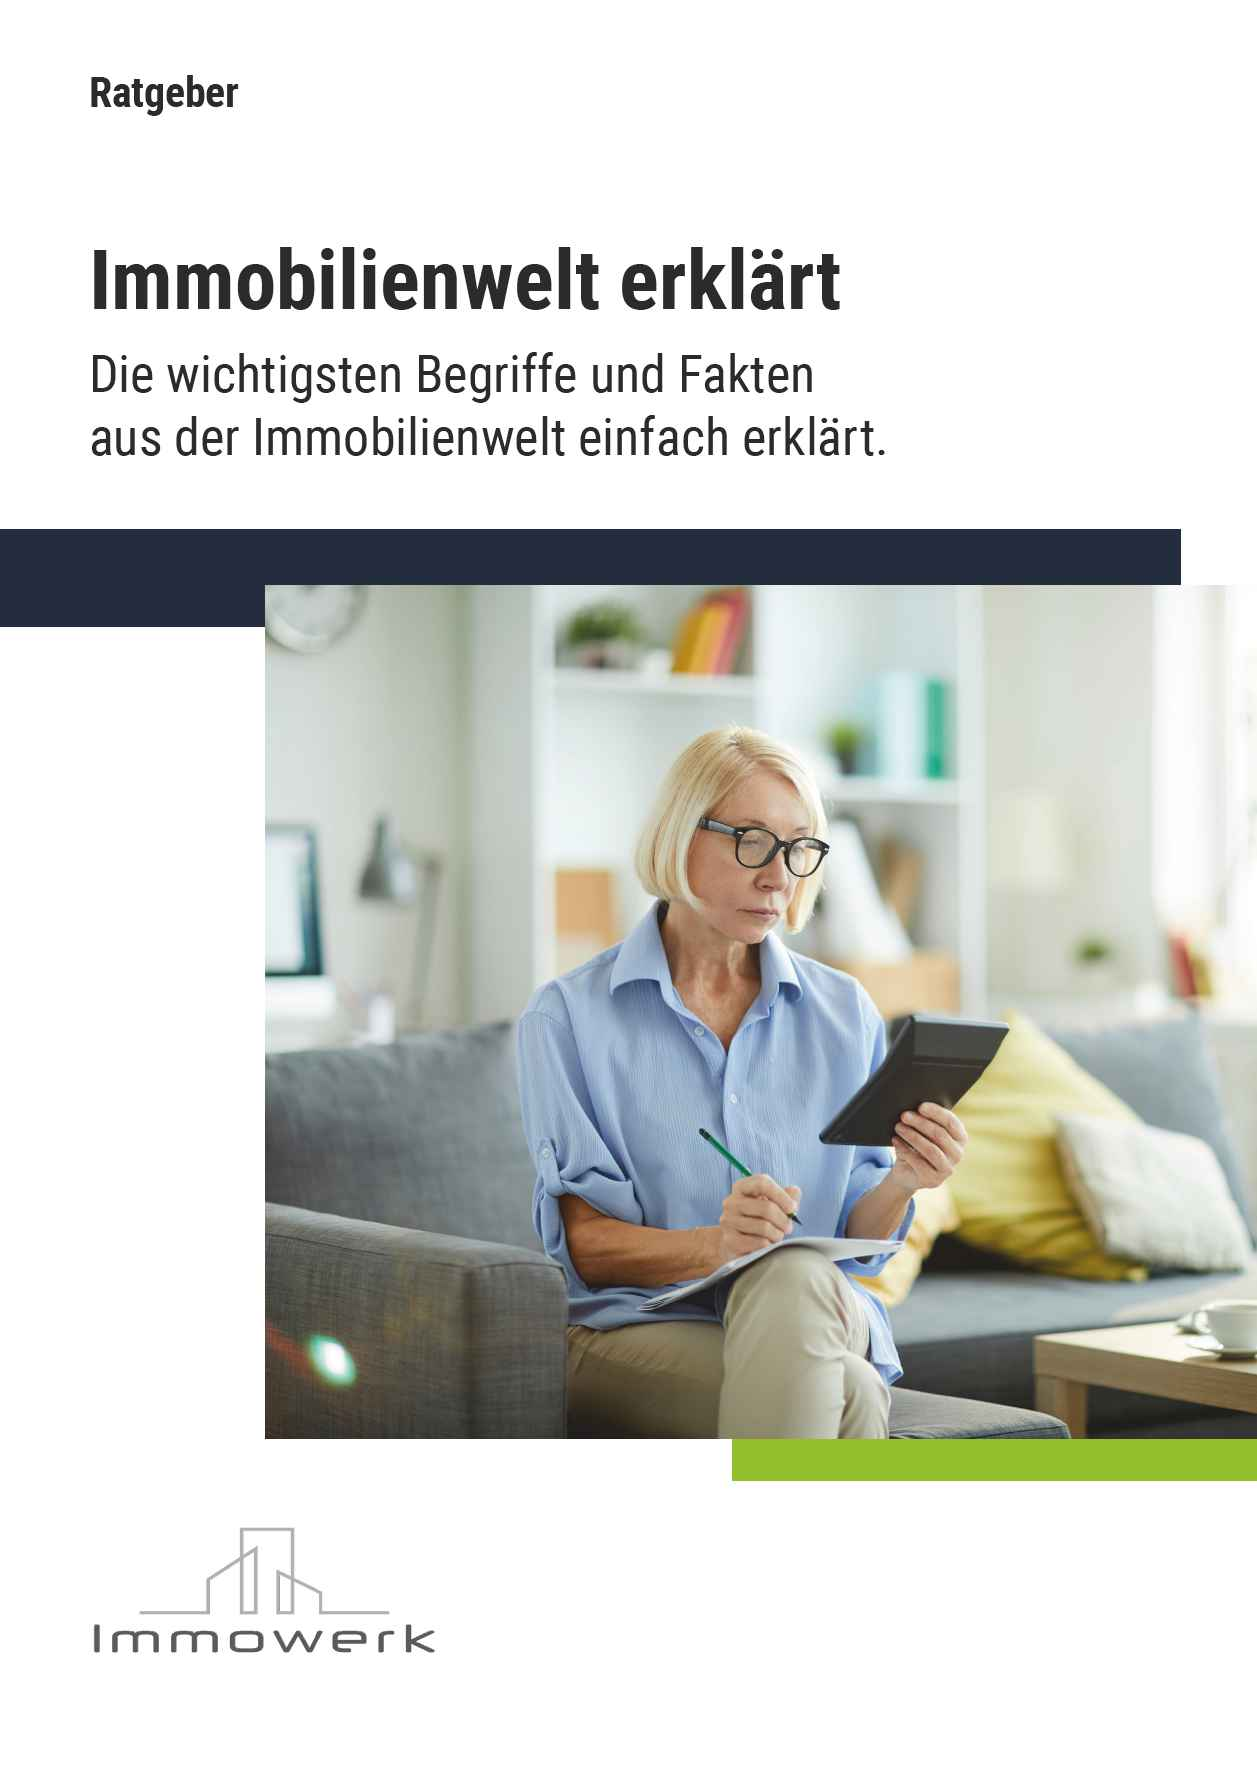 Ratgeber - Immobilienwelt erklärt